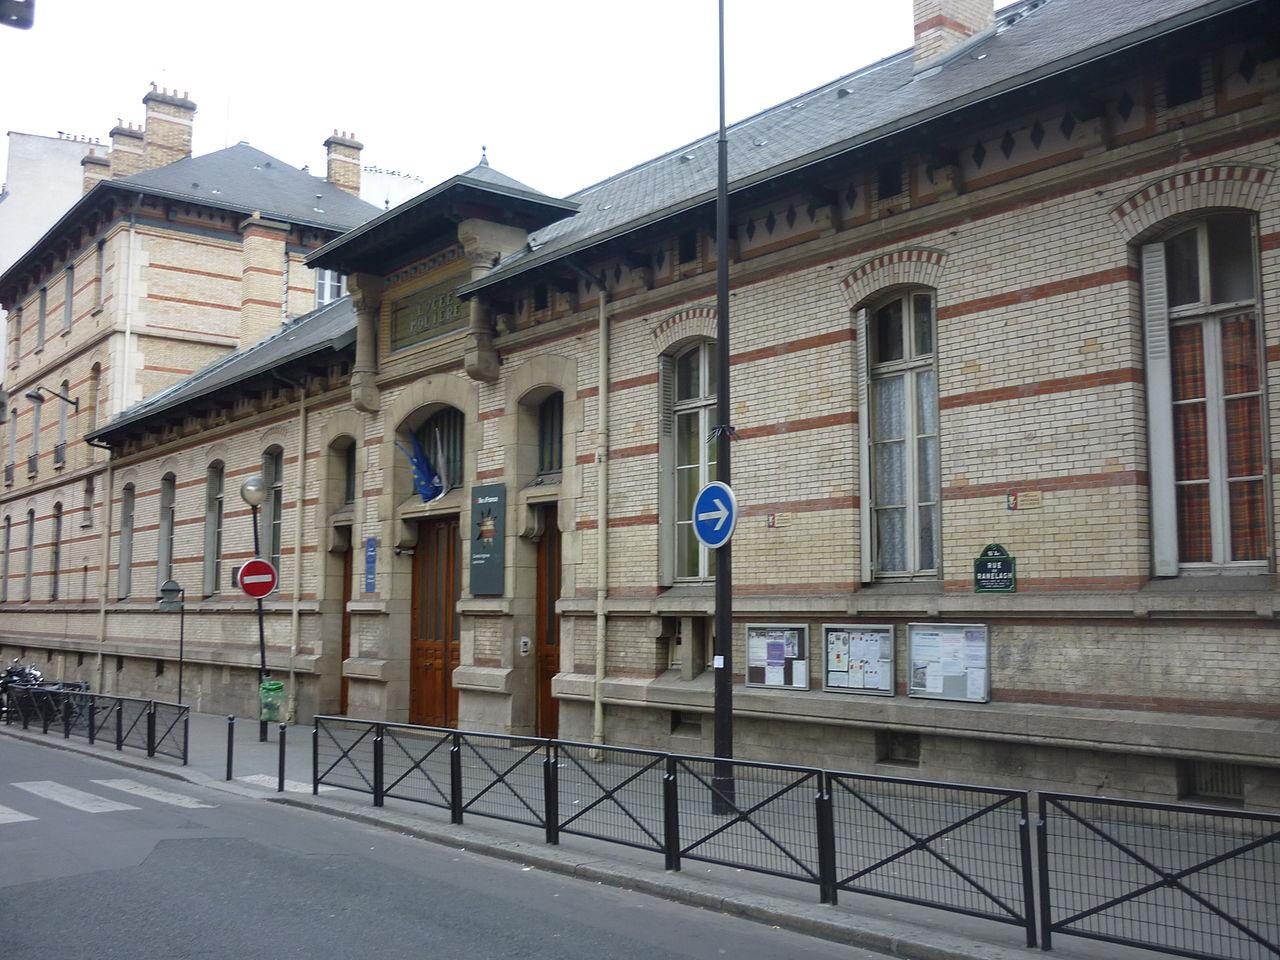 Restauration Scolaire Paris Em Camille See